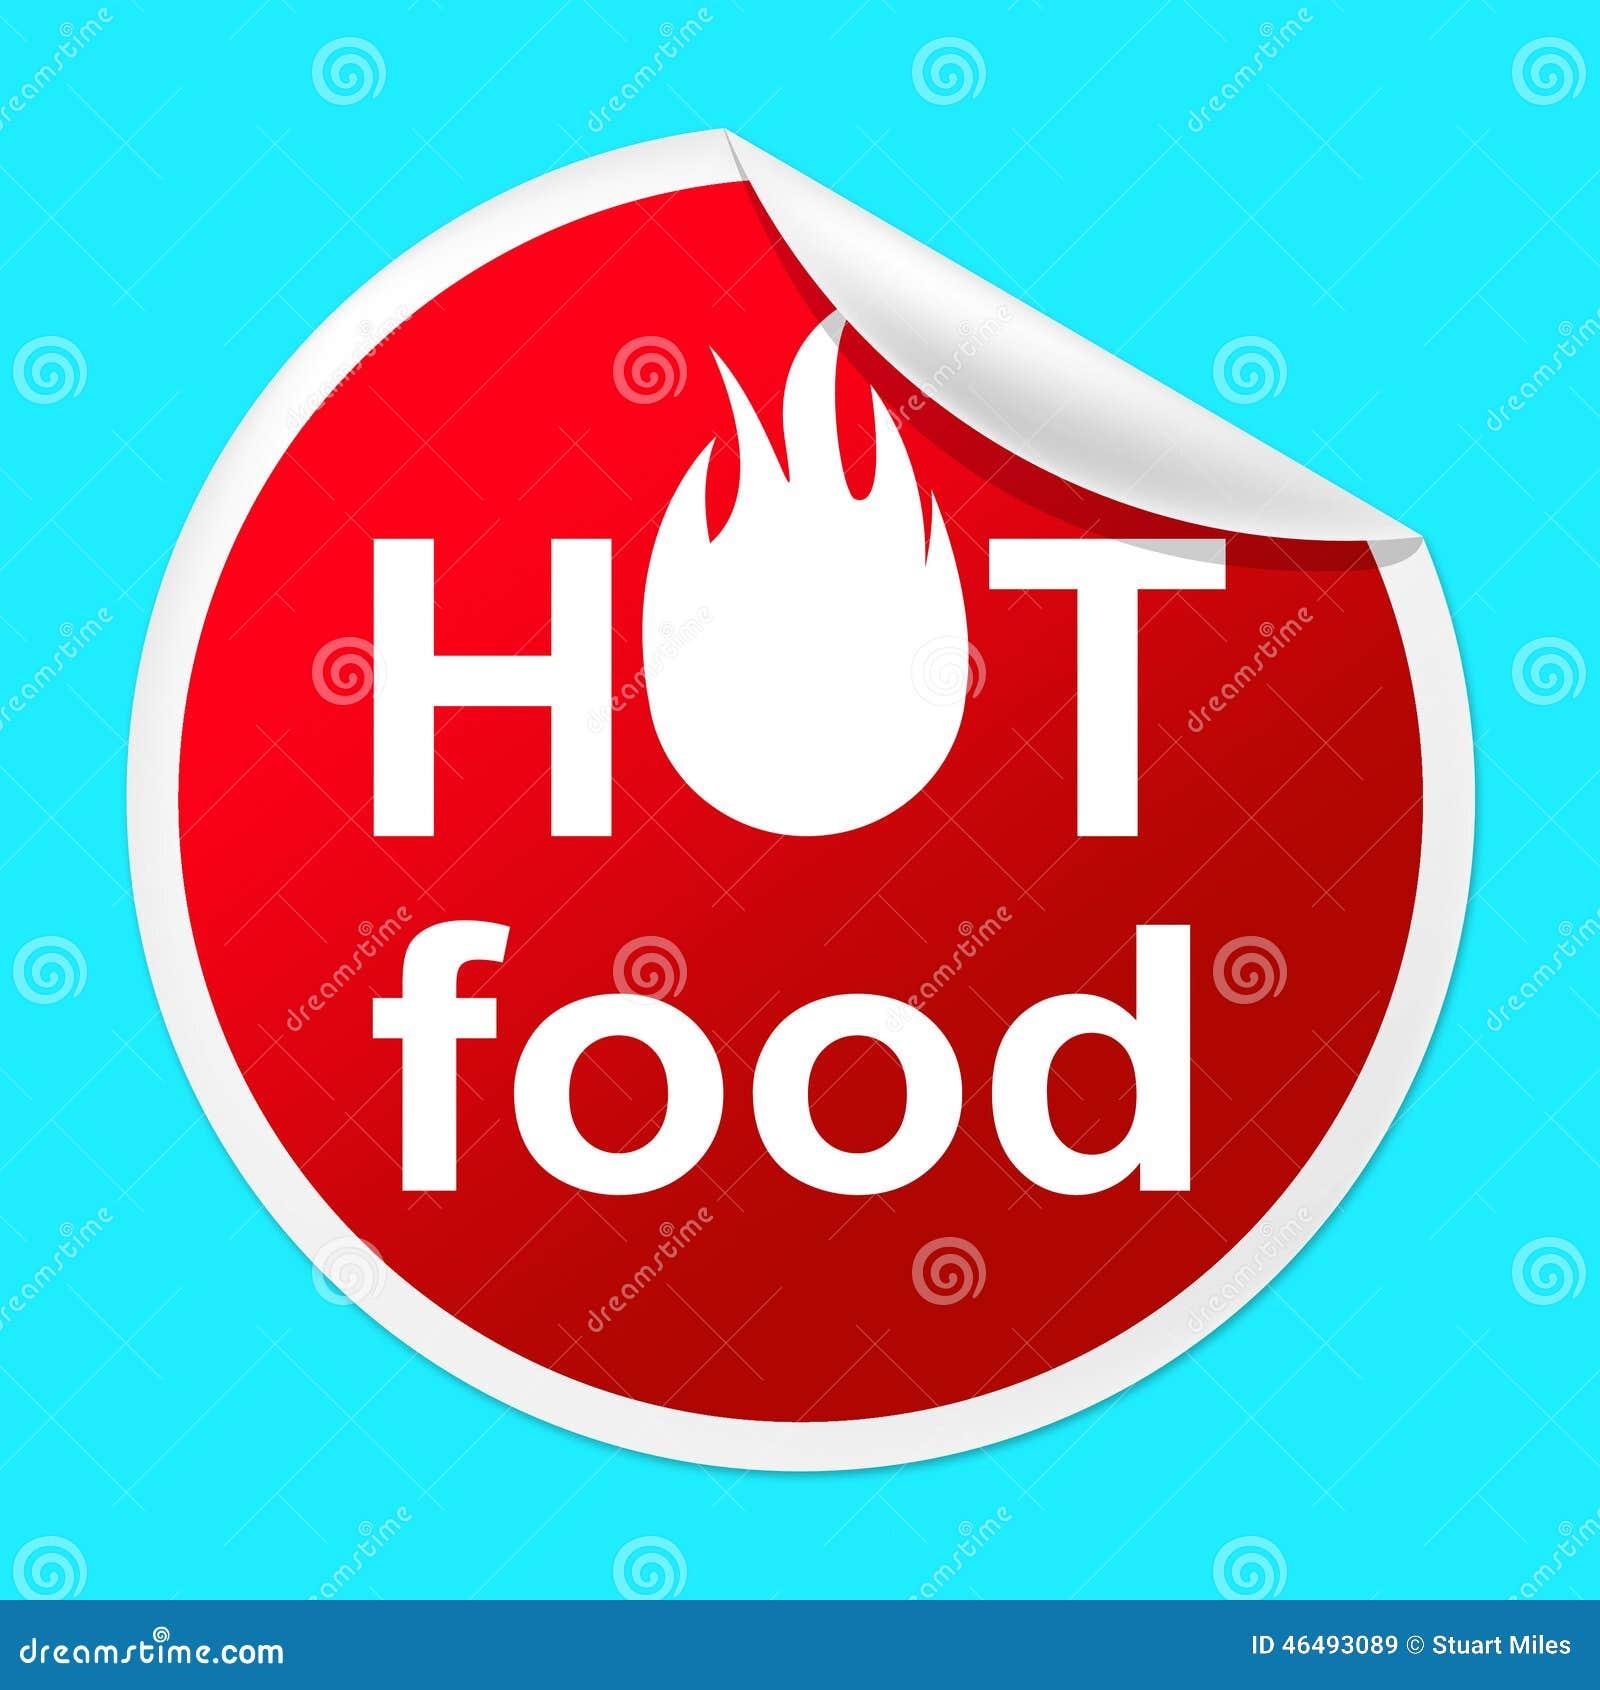 Hot Food Sticker Indicates Temperature Indicator And Best